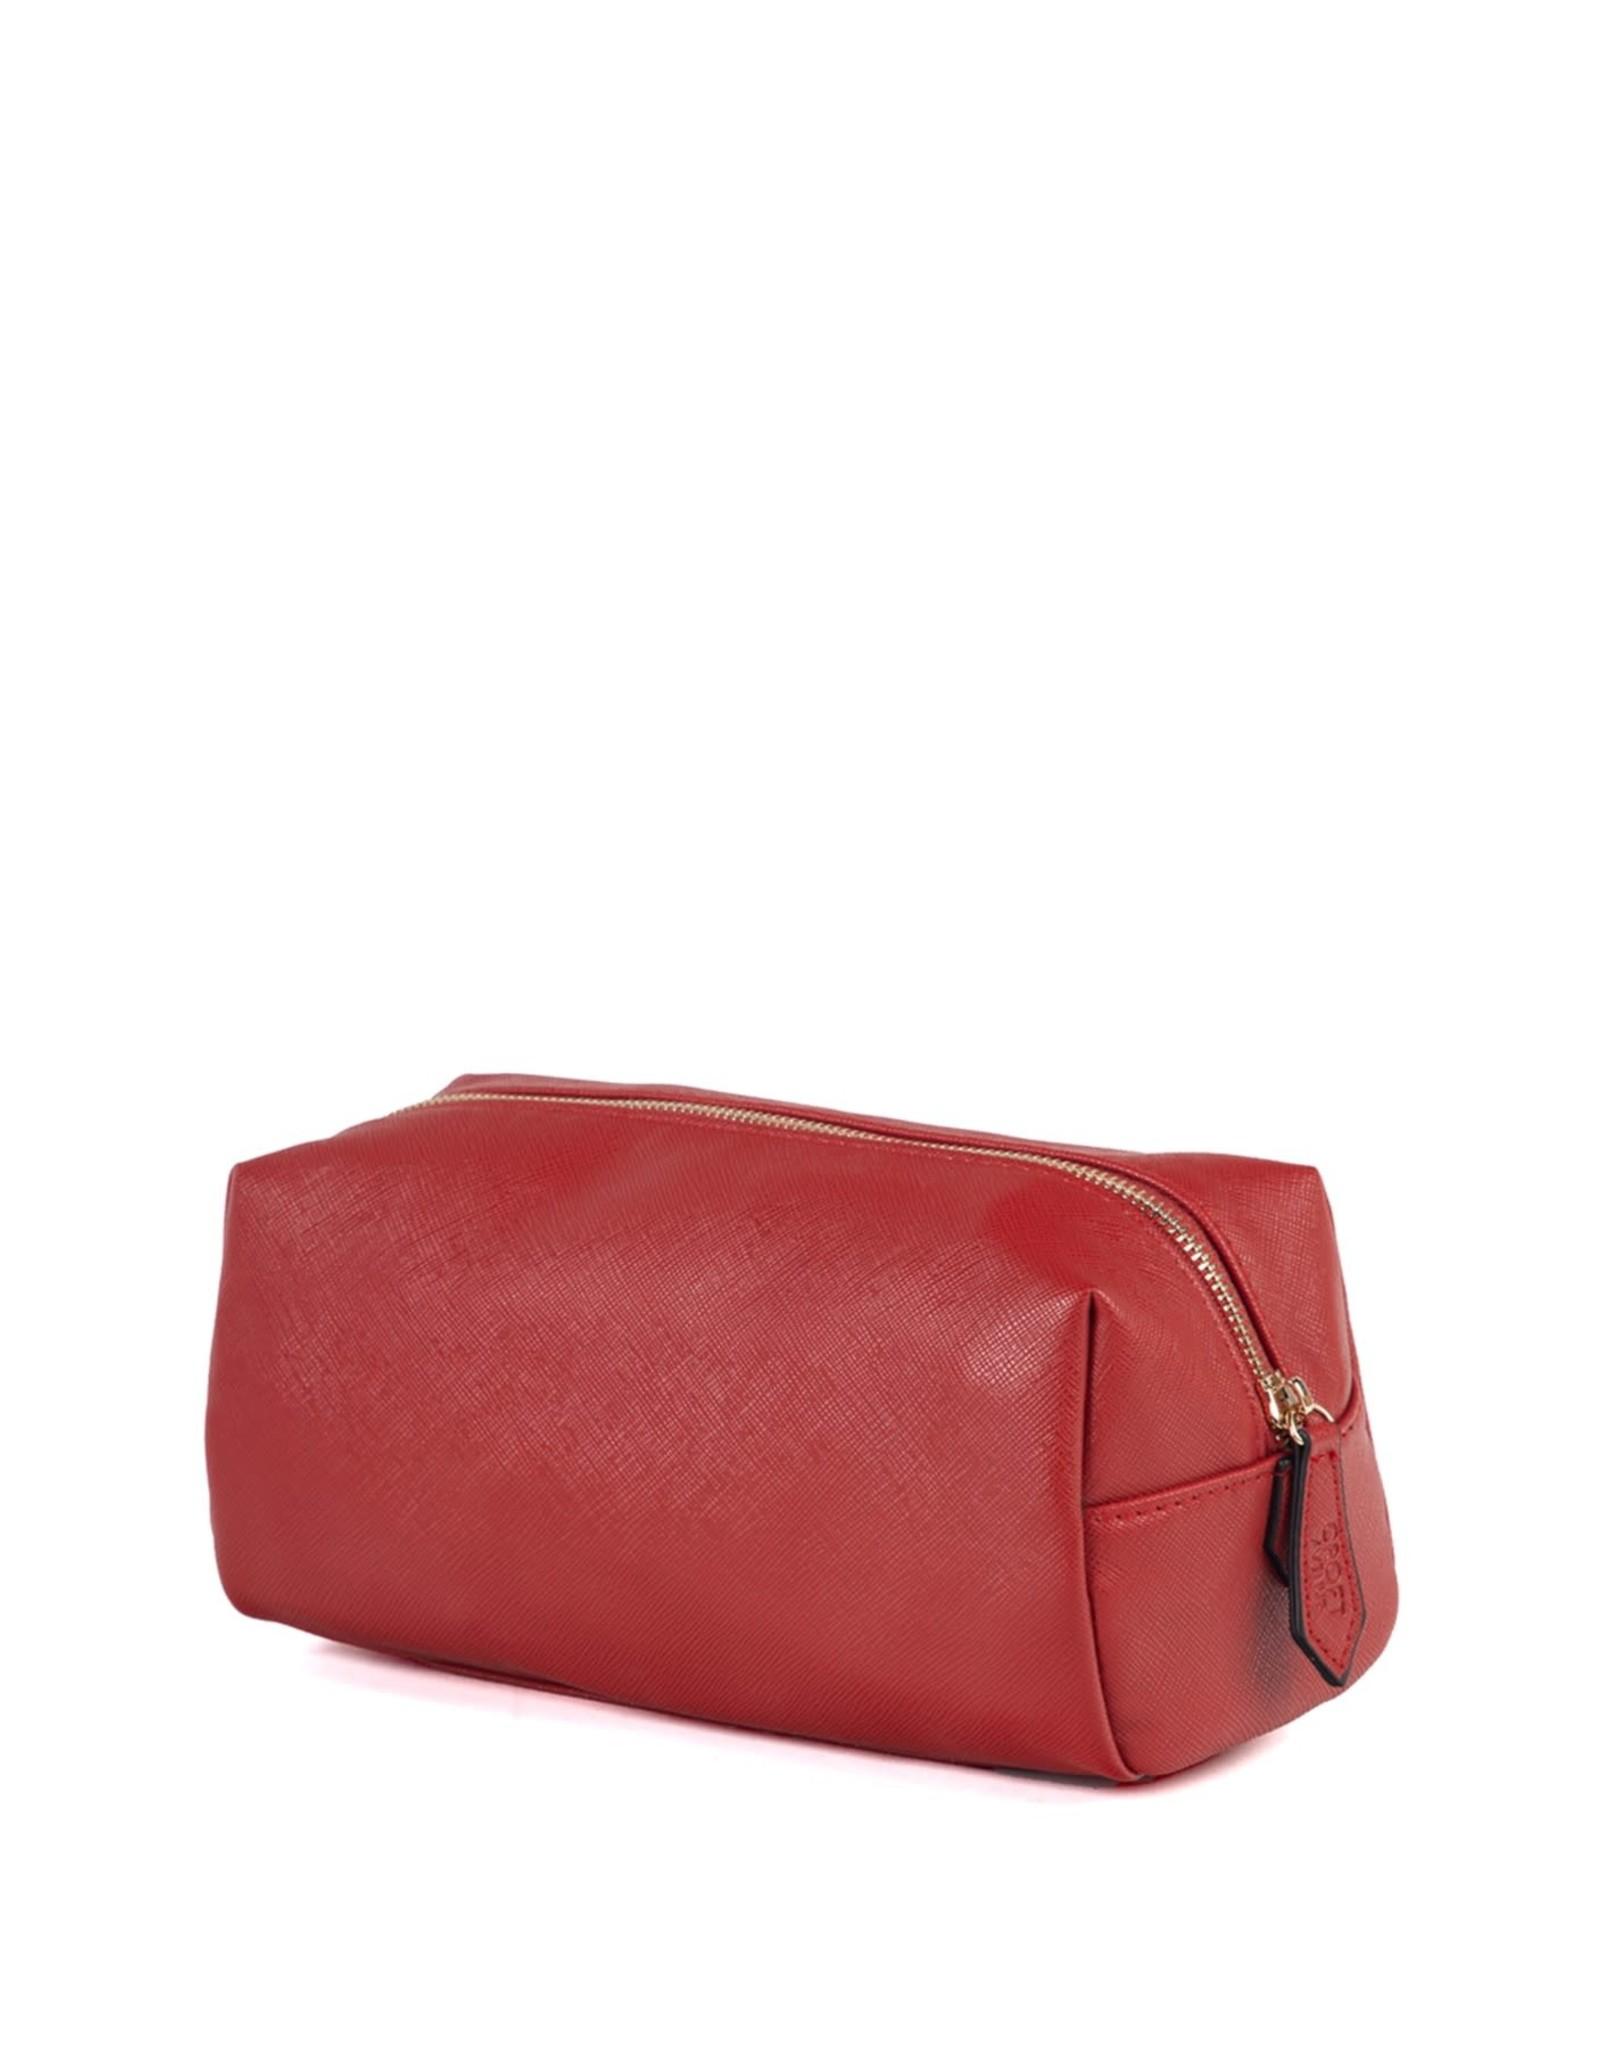 Brouk & Co Alexa Toiletry Bag Red